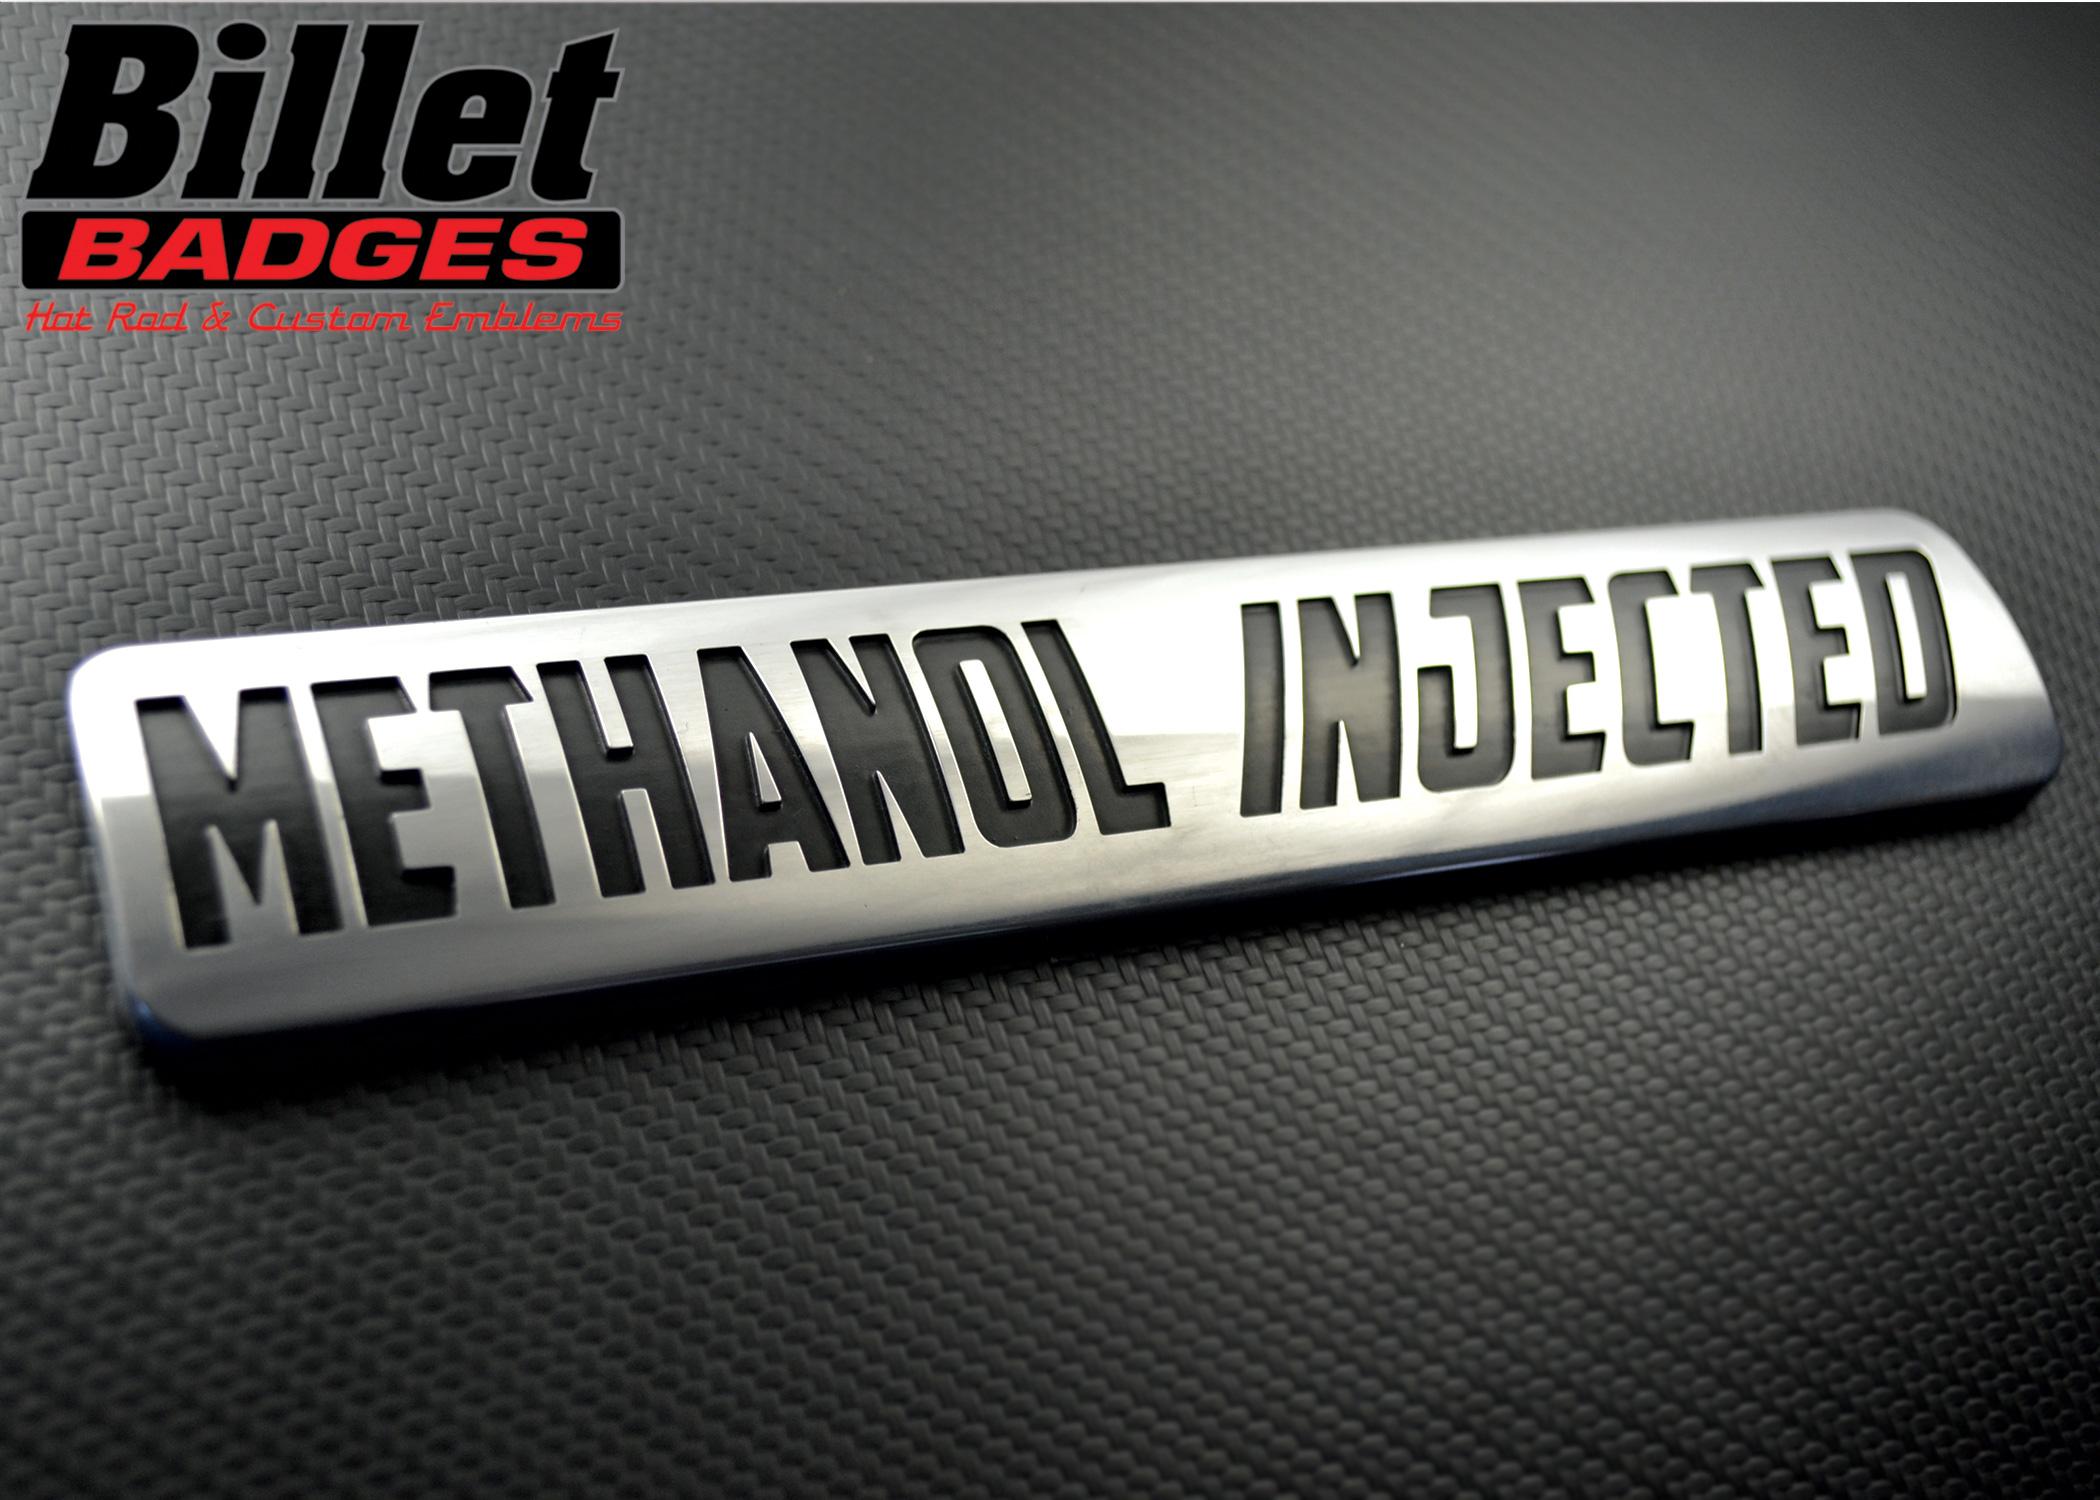 Methanol Injected